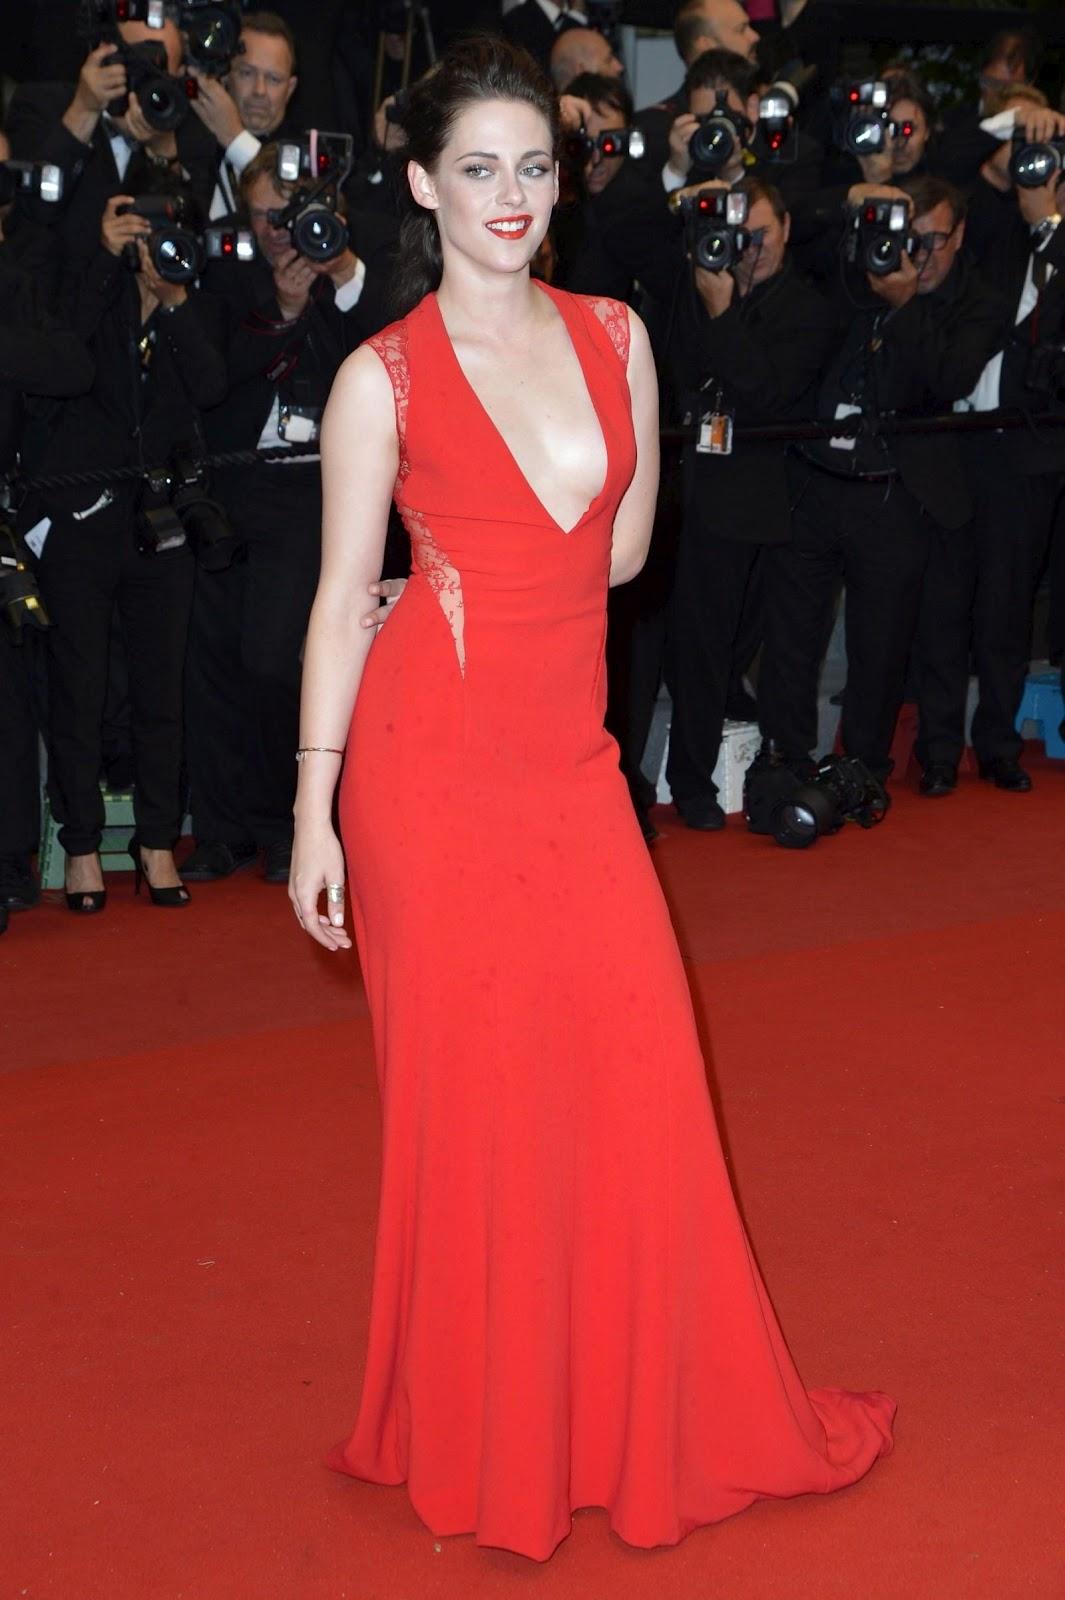 http://2.bp.blogspot.com/-qXxSvqN7sK4/T8ZT2imVFUI/AAAAAAAASfw/_sFc238vSes/s1600/Kristen_Stewart_red_gown_in_Cannes_04.jpg